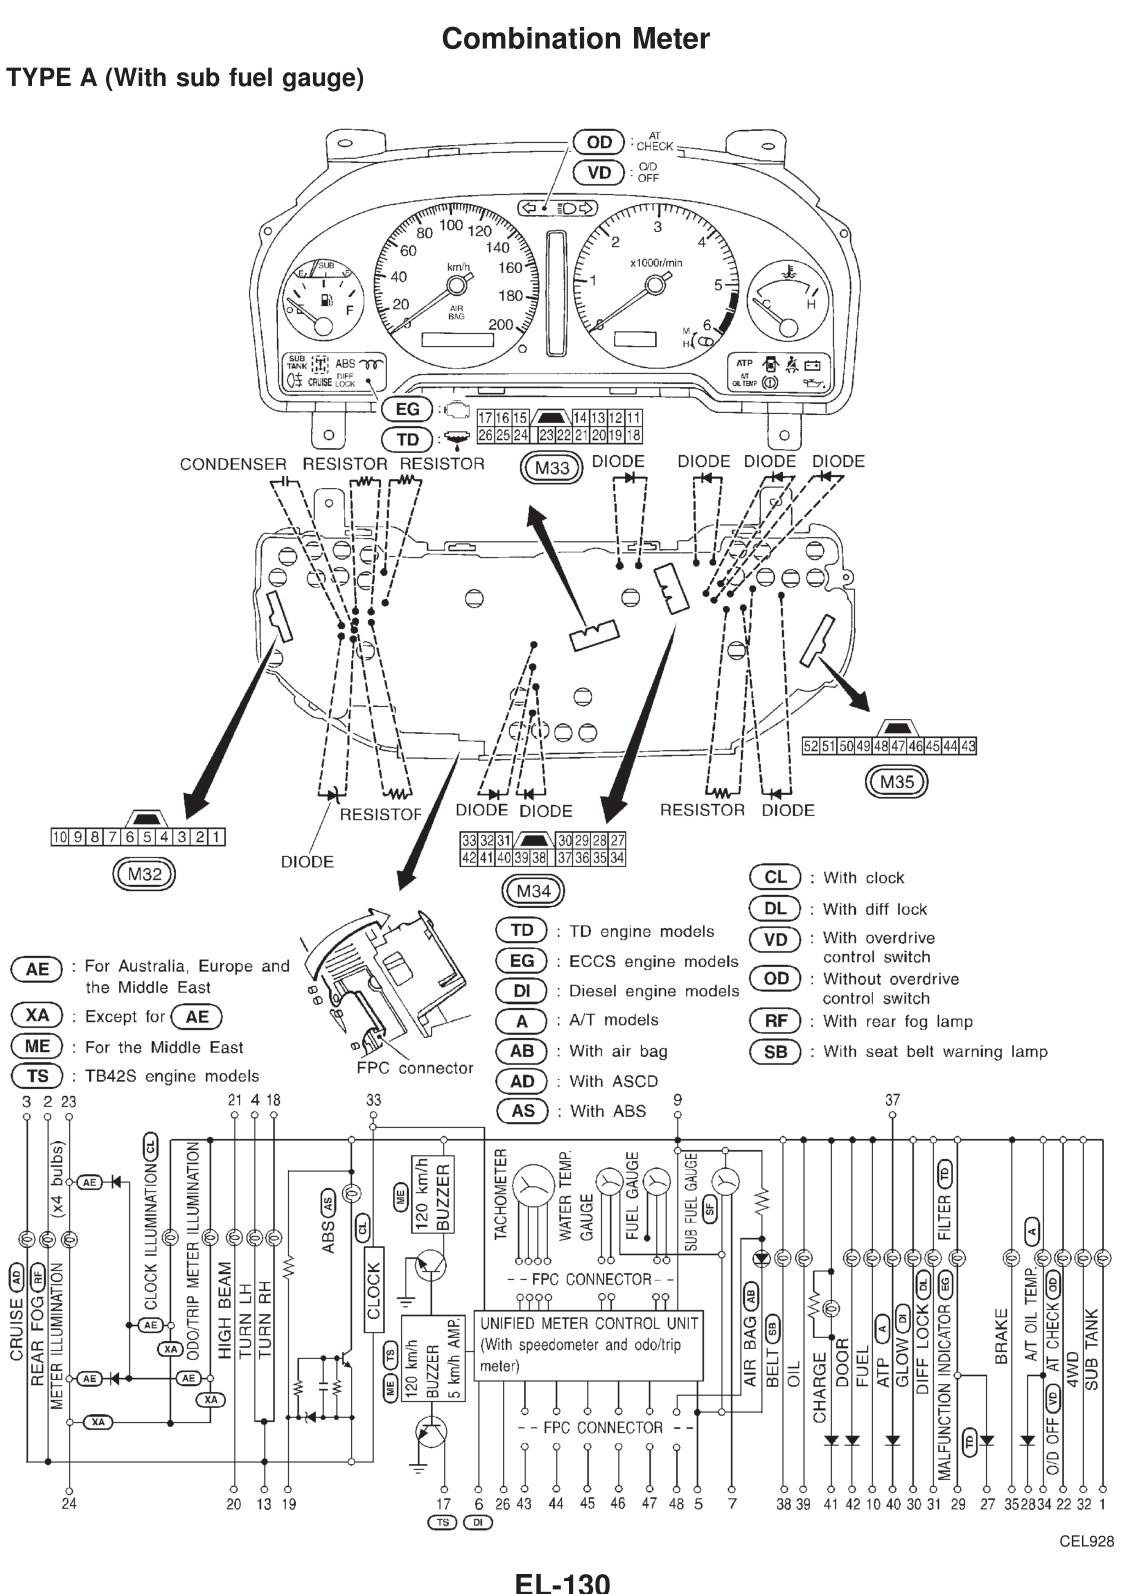 hight resolution of nissan patrol wiring diagram download wiring diagram sample 1990 nissan patrol wiring diagram download nissan patrol wiring diagram download